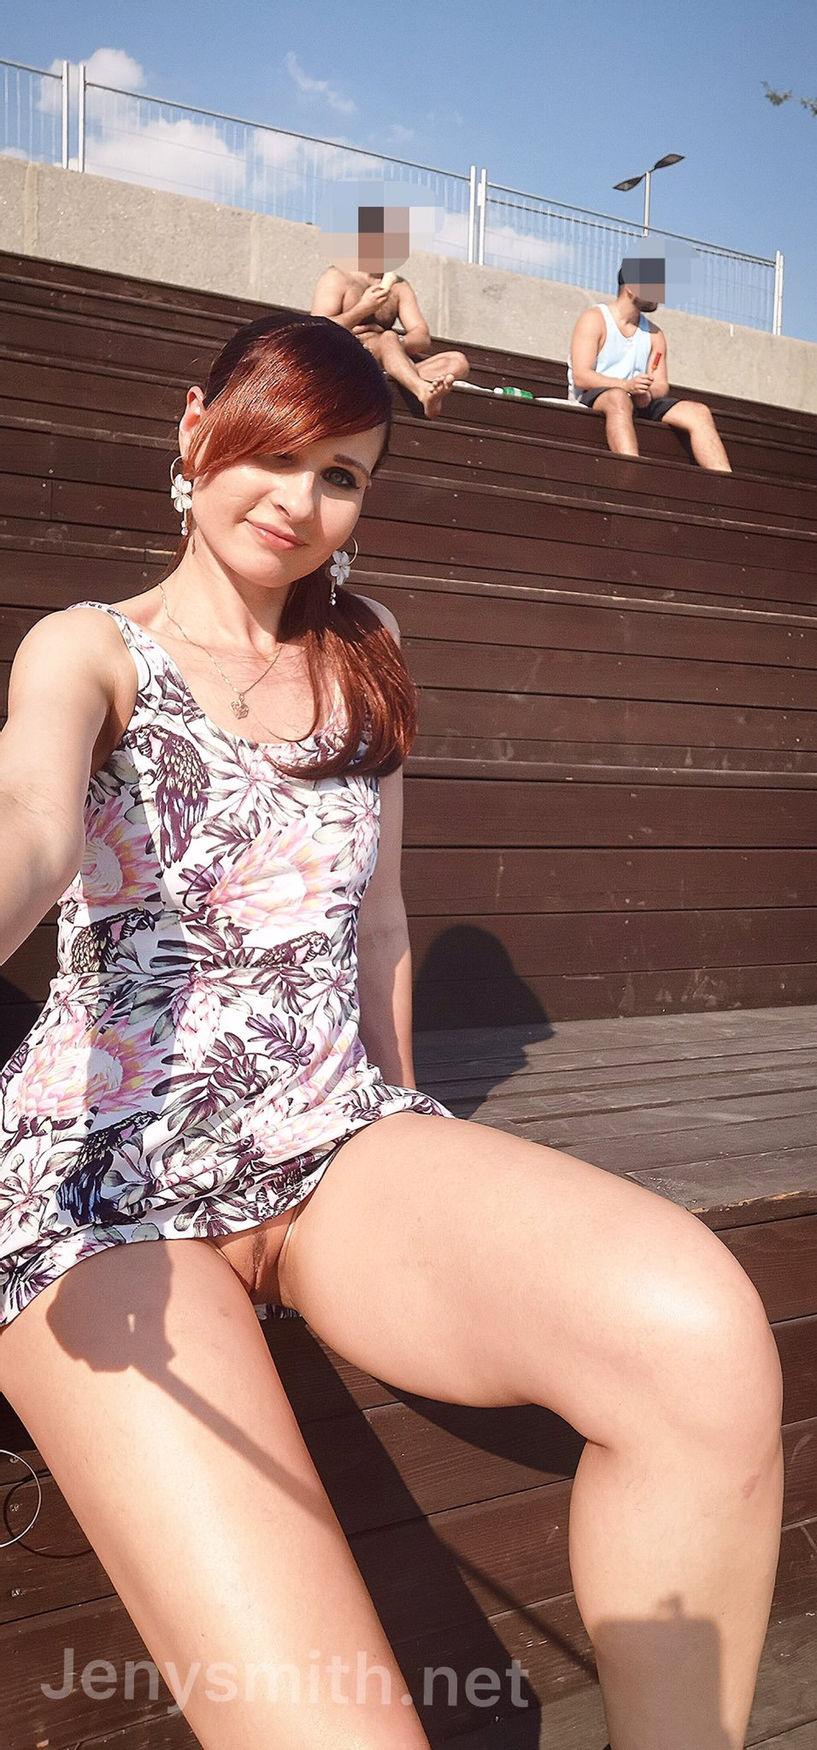 public pantyless upskirt pussy photo of redhead glamour model Jeny Smith